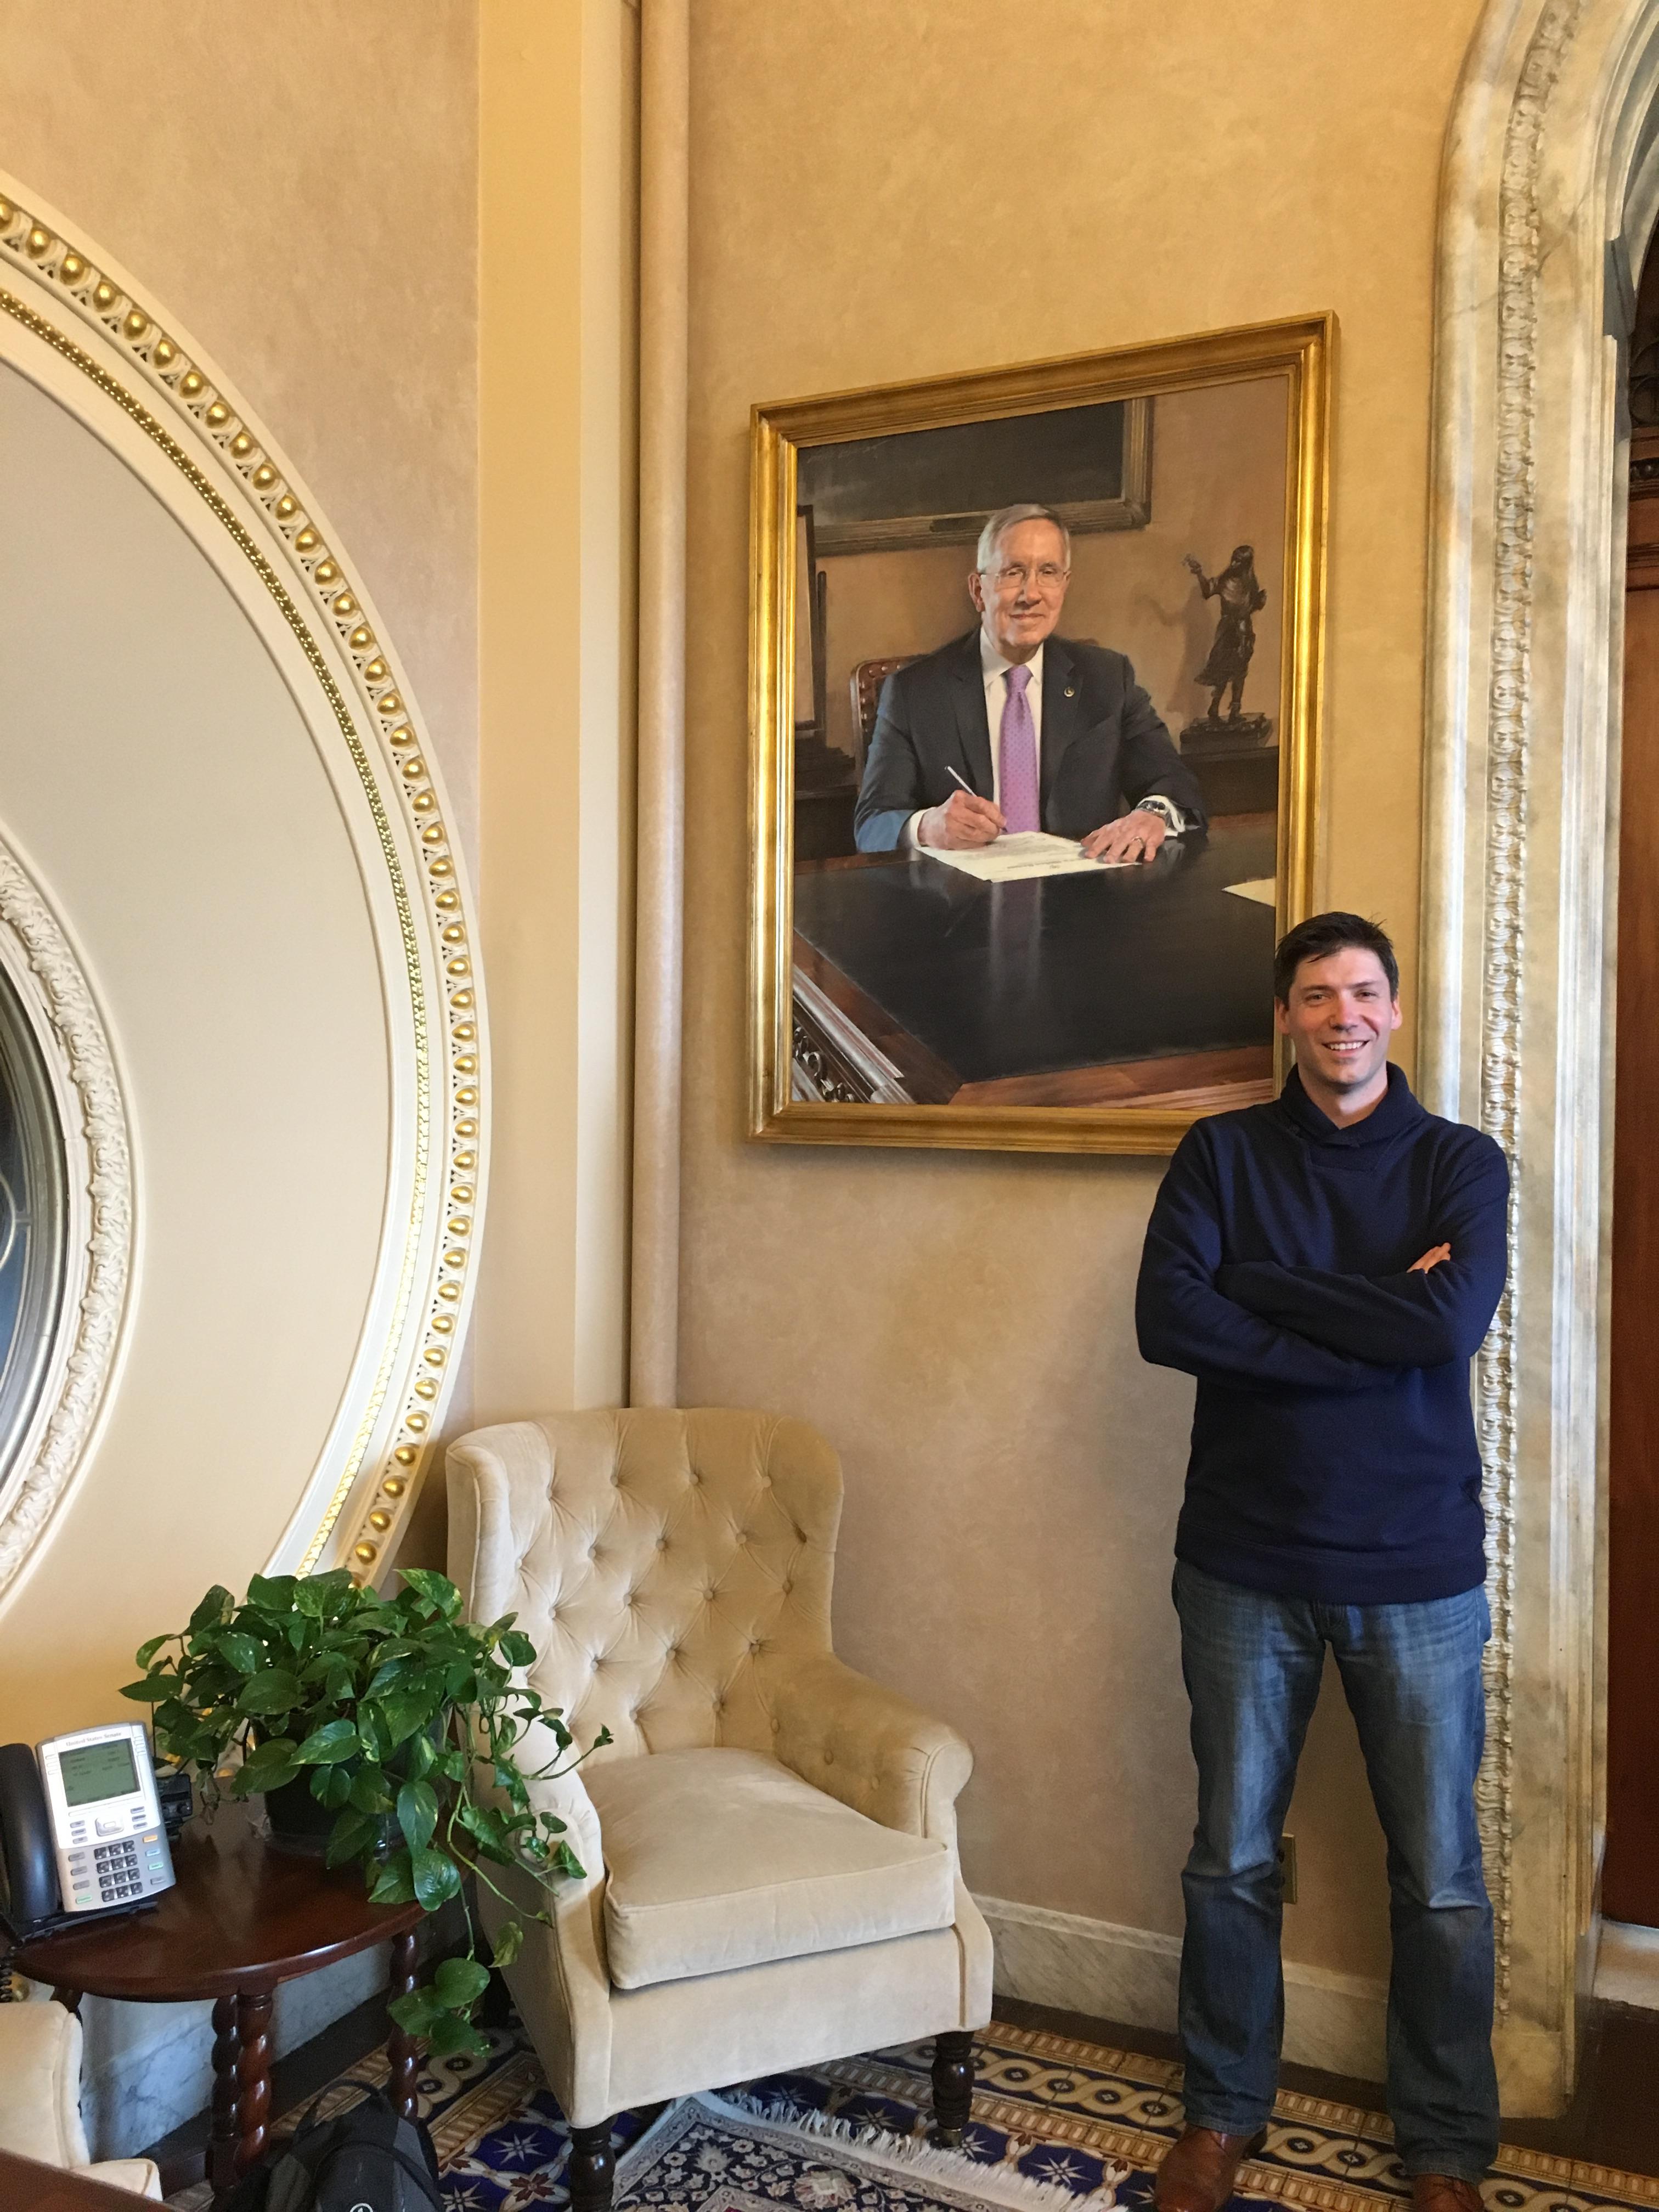 Me Reid ptg Schumer Office